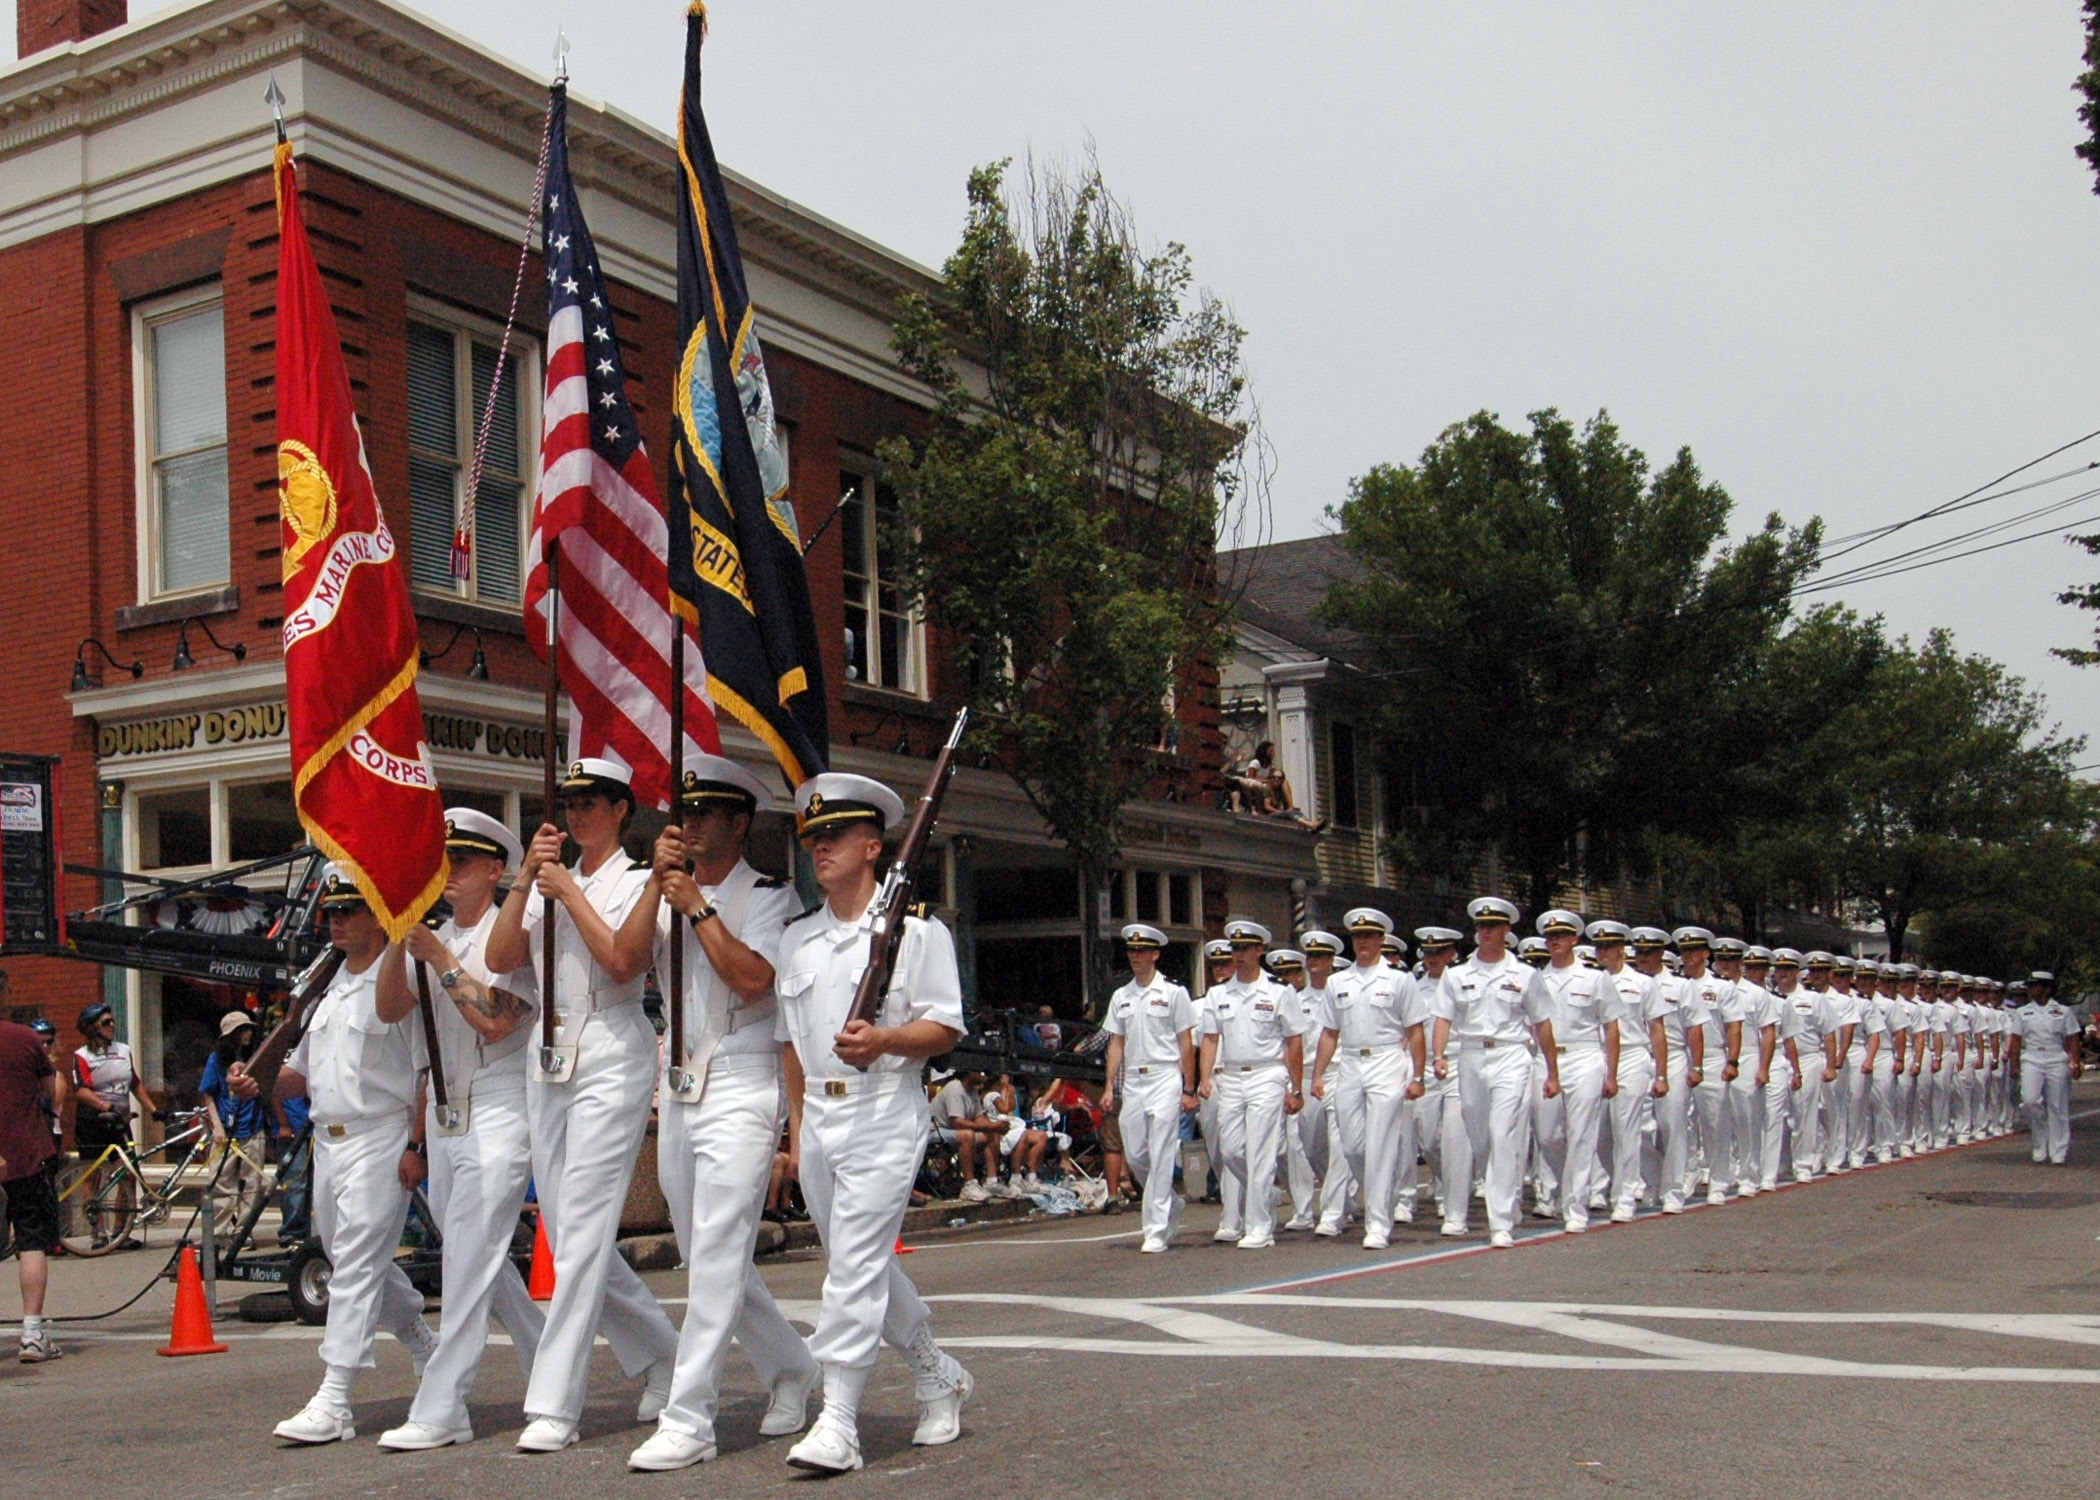 Military School In Rhode Island